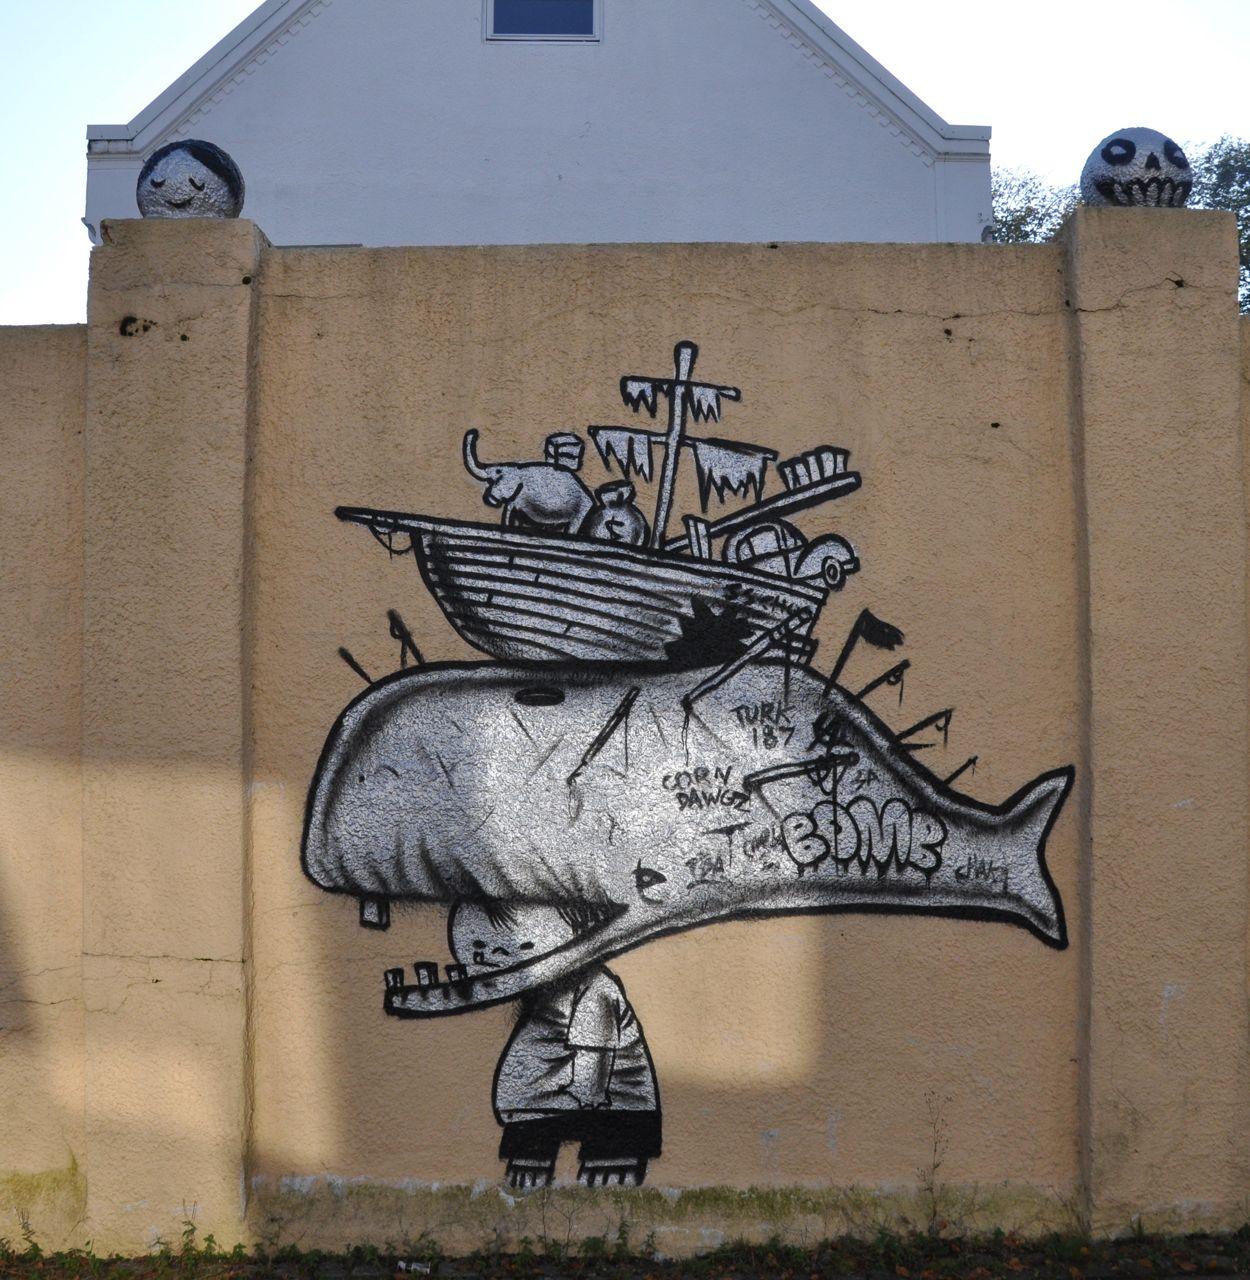 260-2011-david-choe-dvs1-street-art-nuart-festival-22.jpg